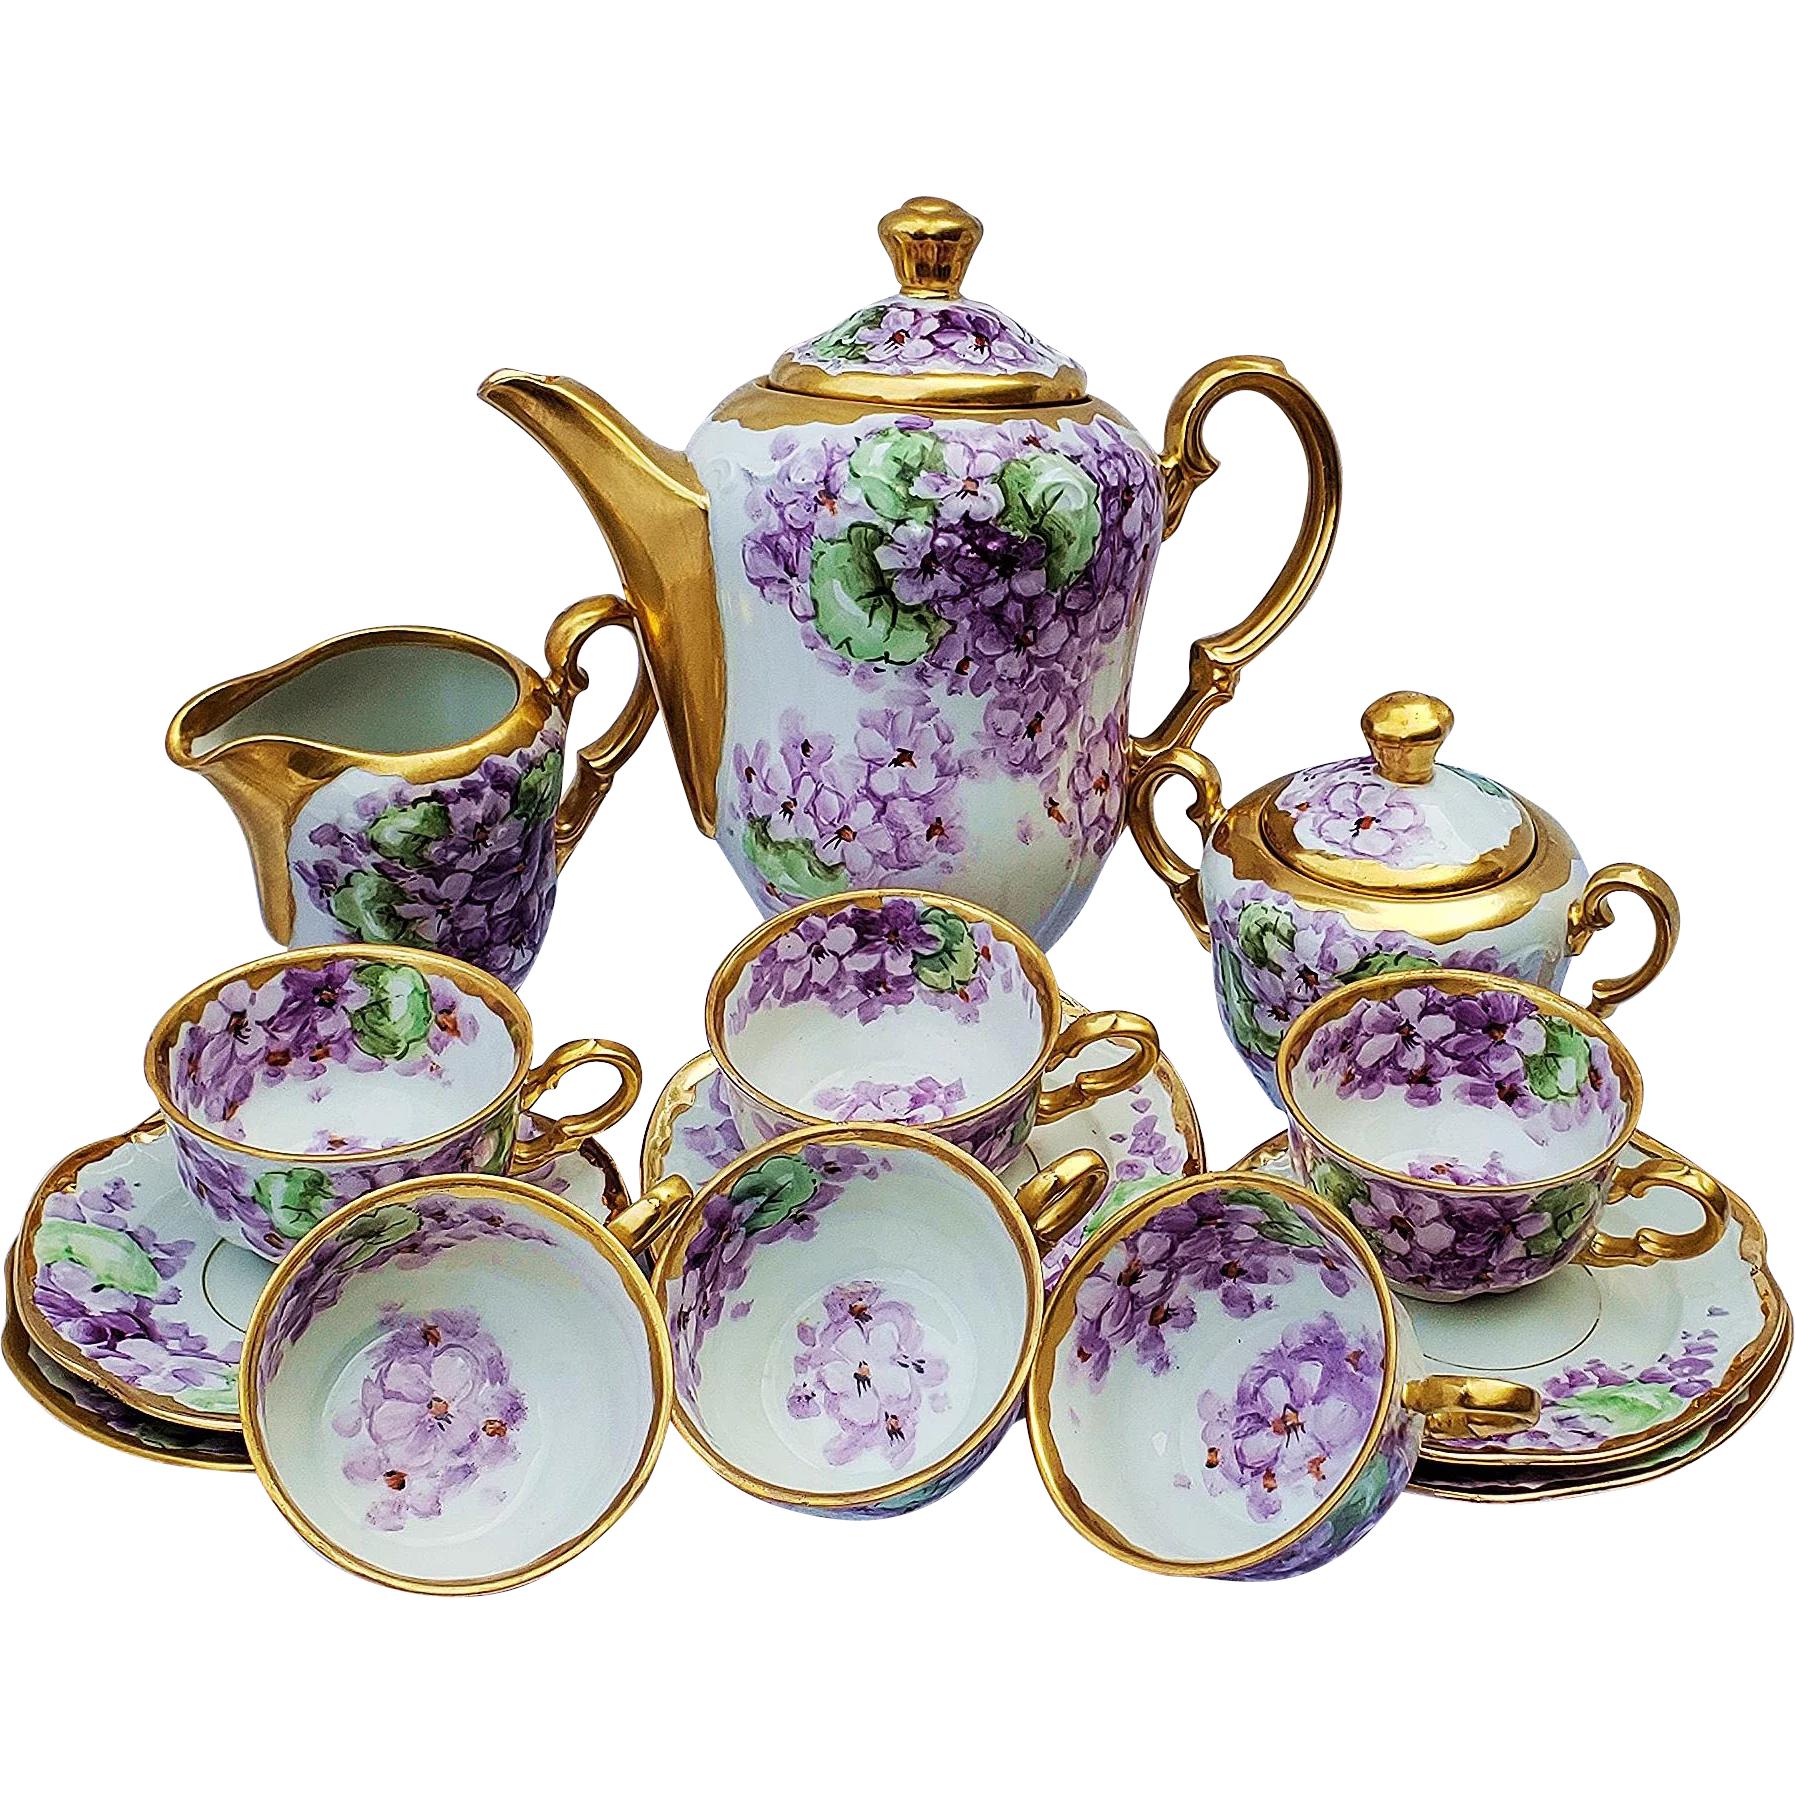 Magnificent Vintage 1910 Hand Painted Lifelike Violets 17 Pc Floral Tea Set by List Chicago Professional Decorator William Wands #teasets